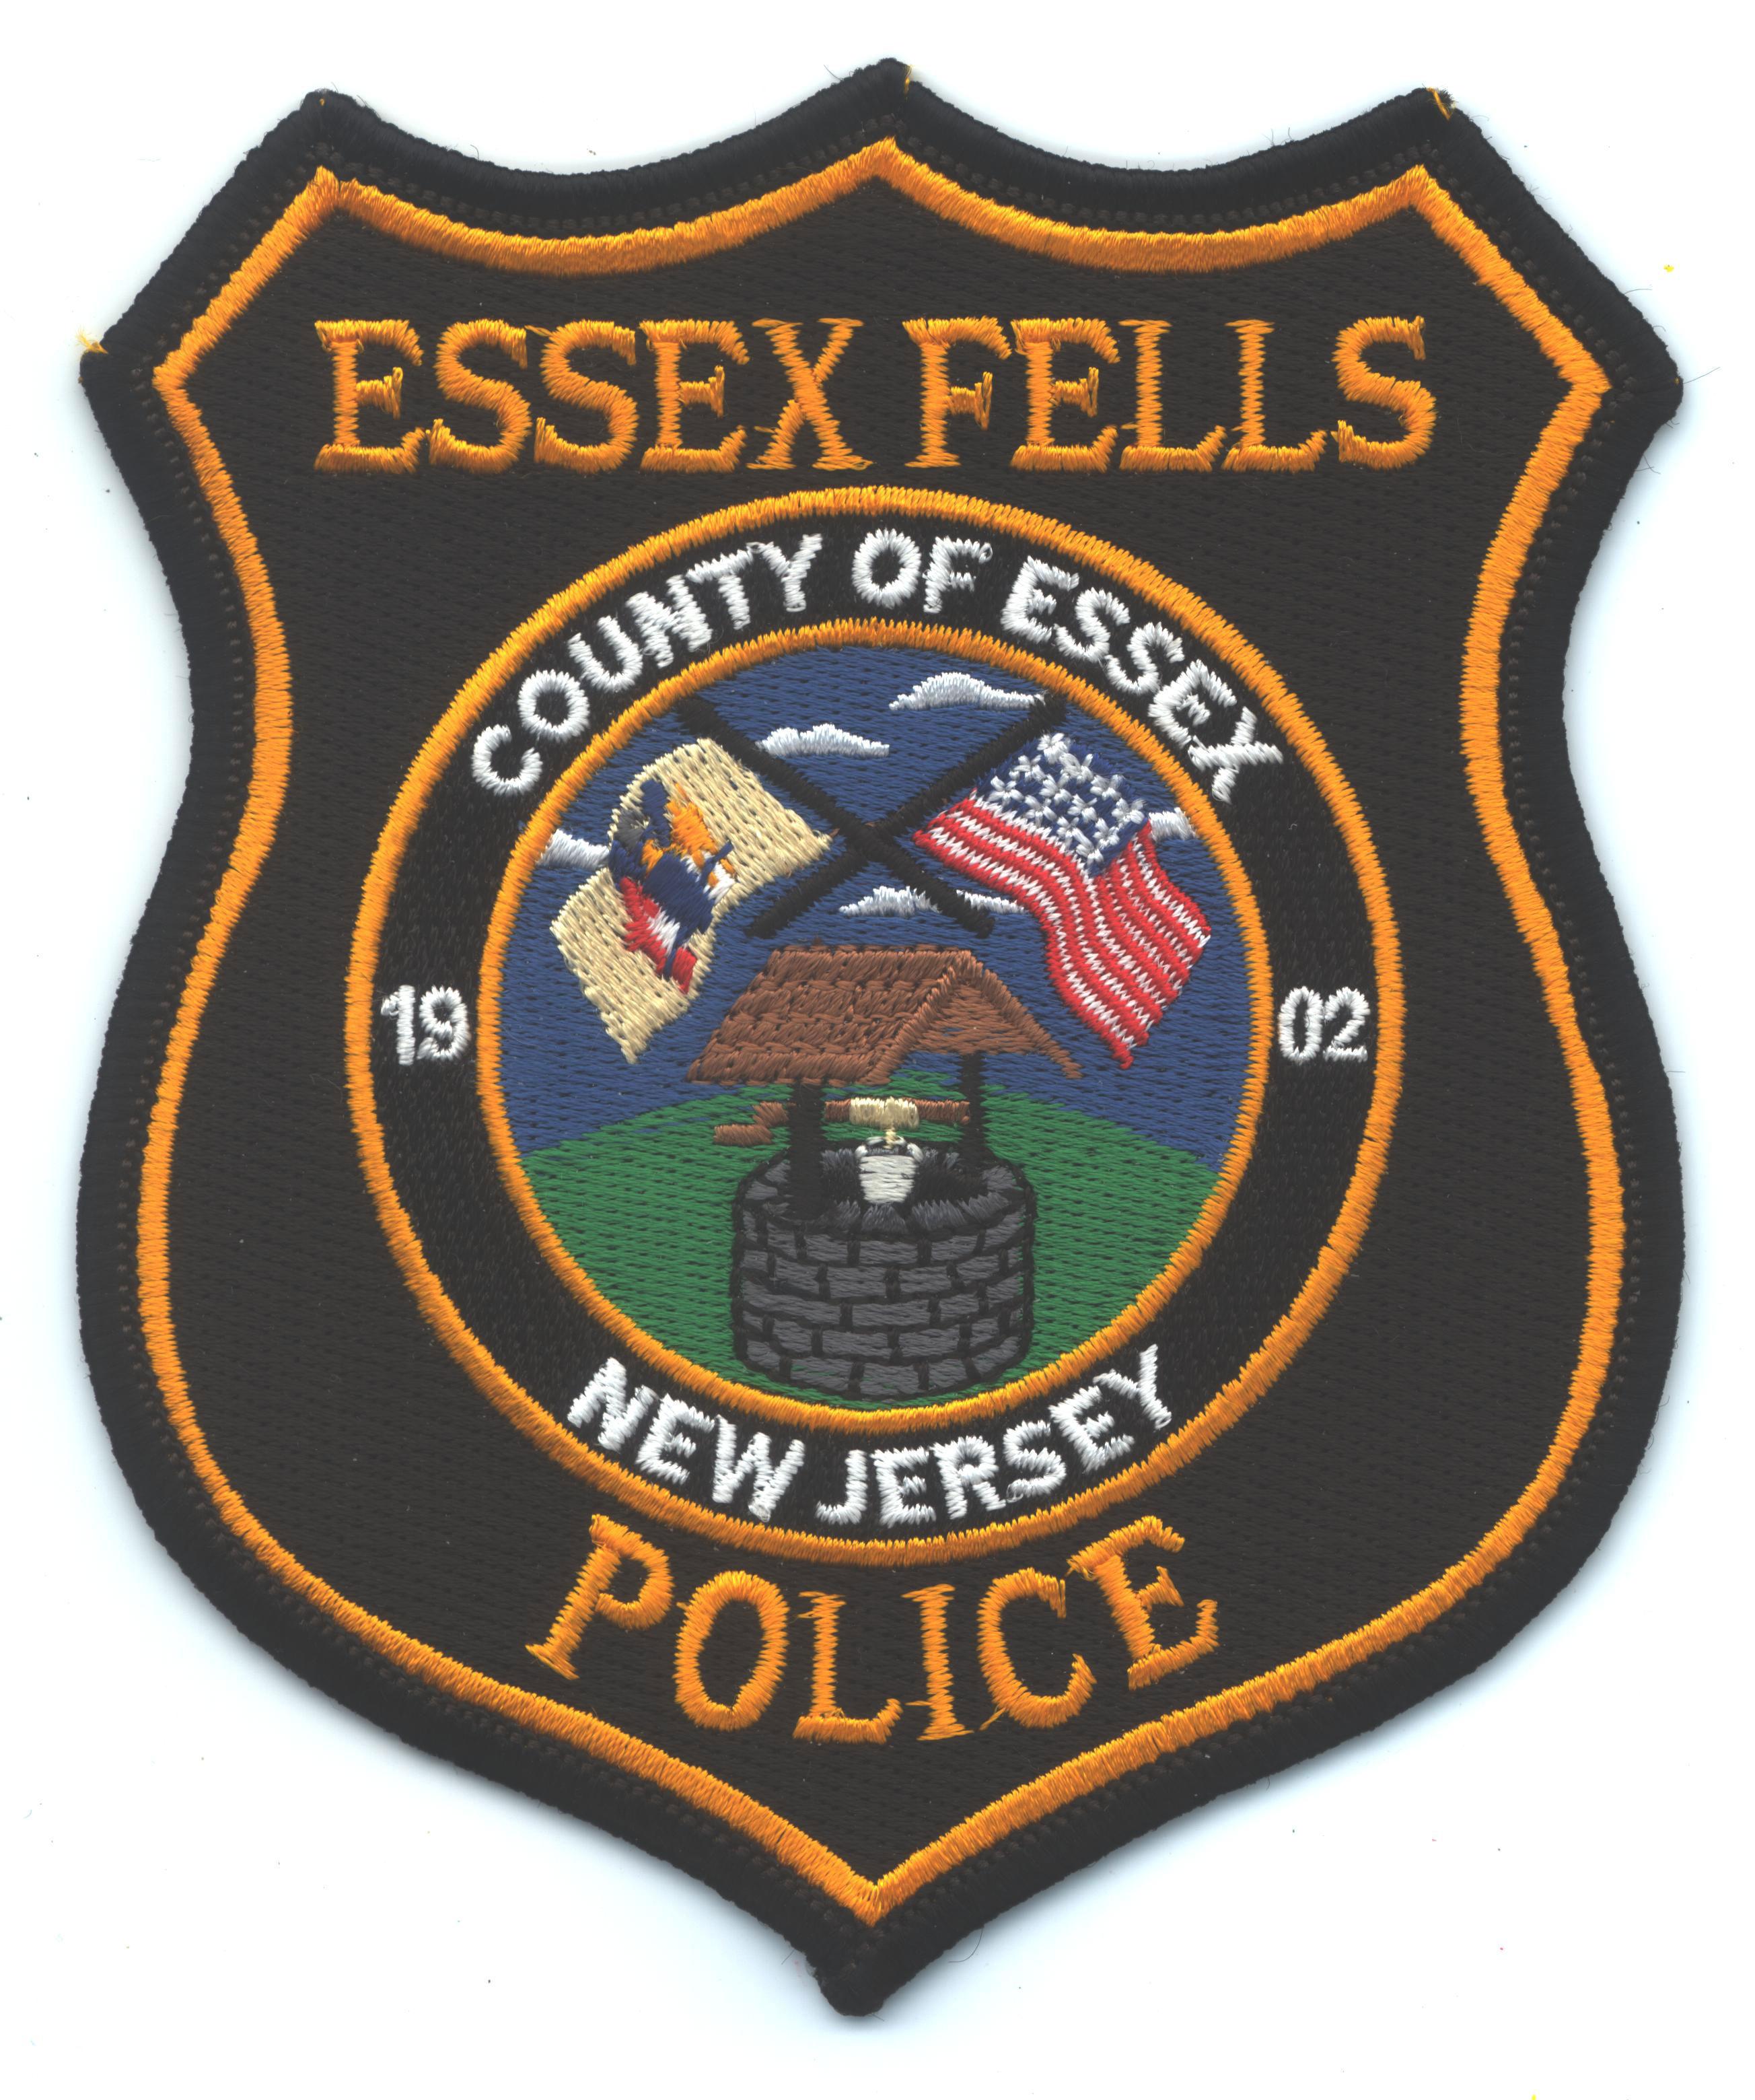 54d9cfef3e2a154f7aa0_Essex_Fells_Police_Badge.jpg